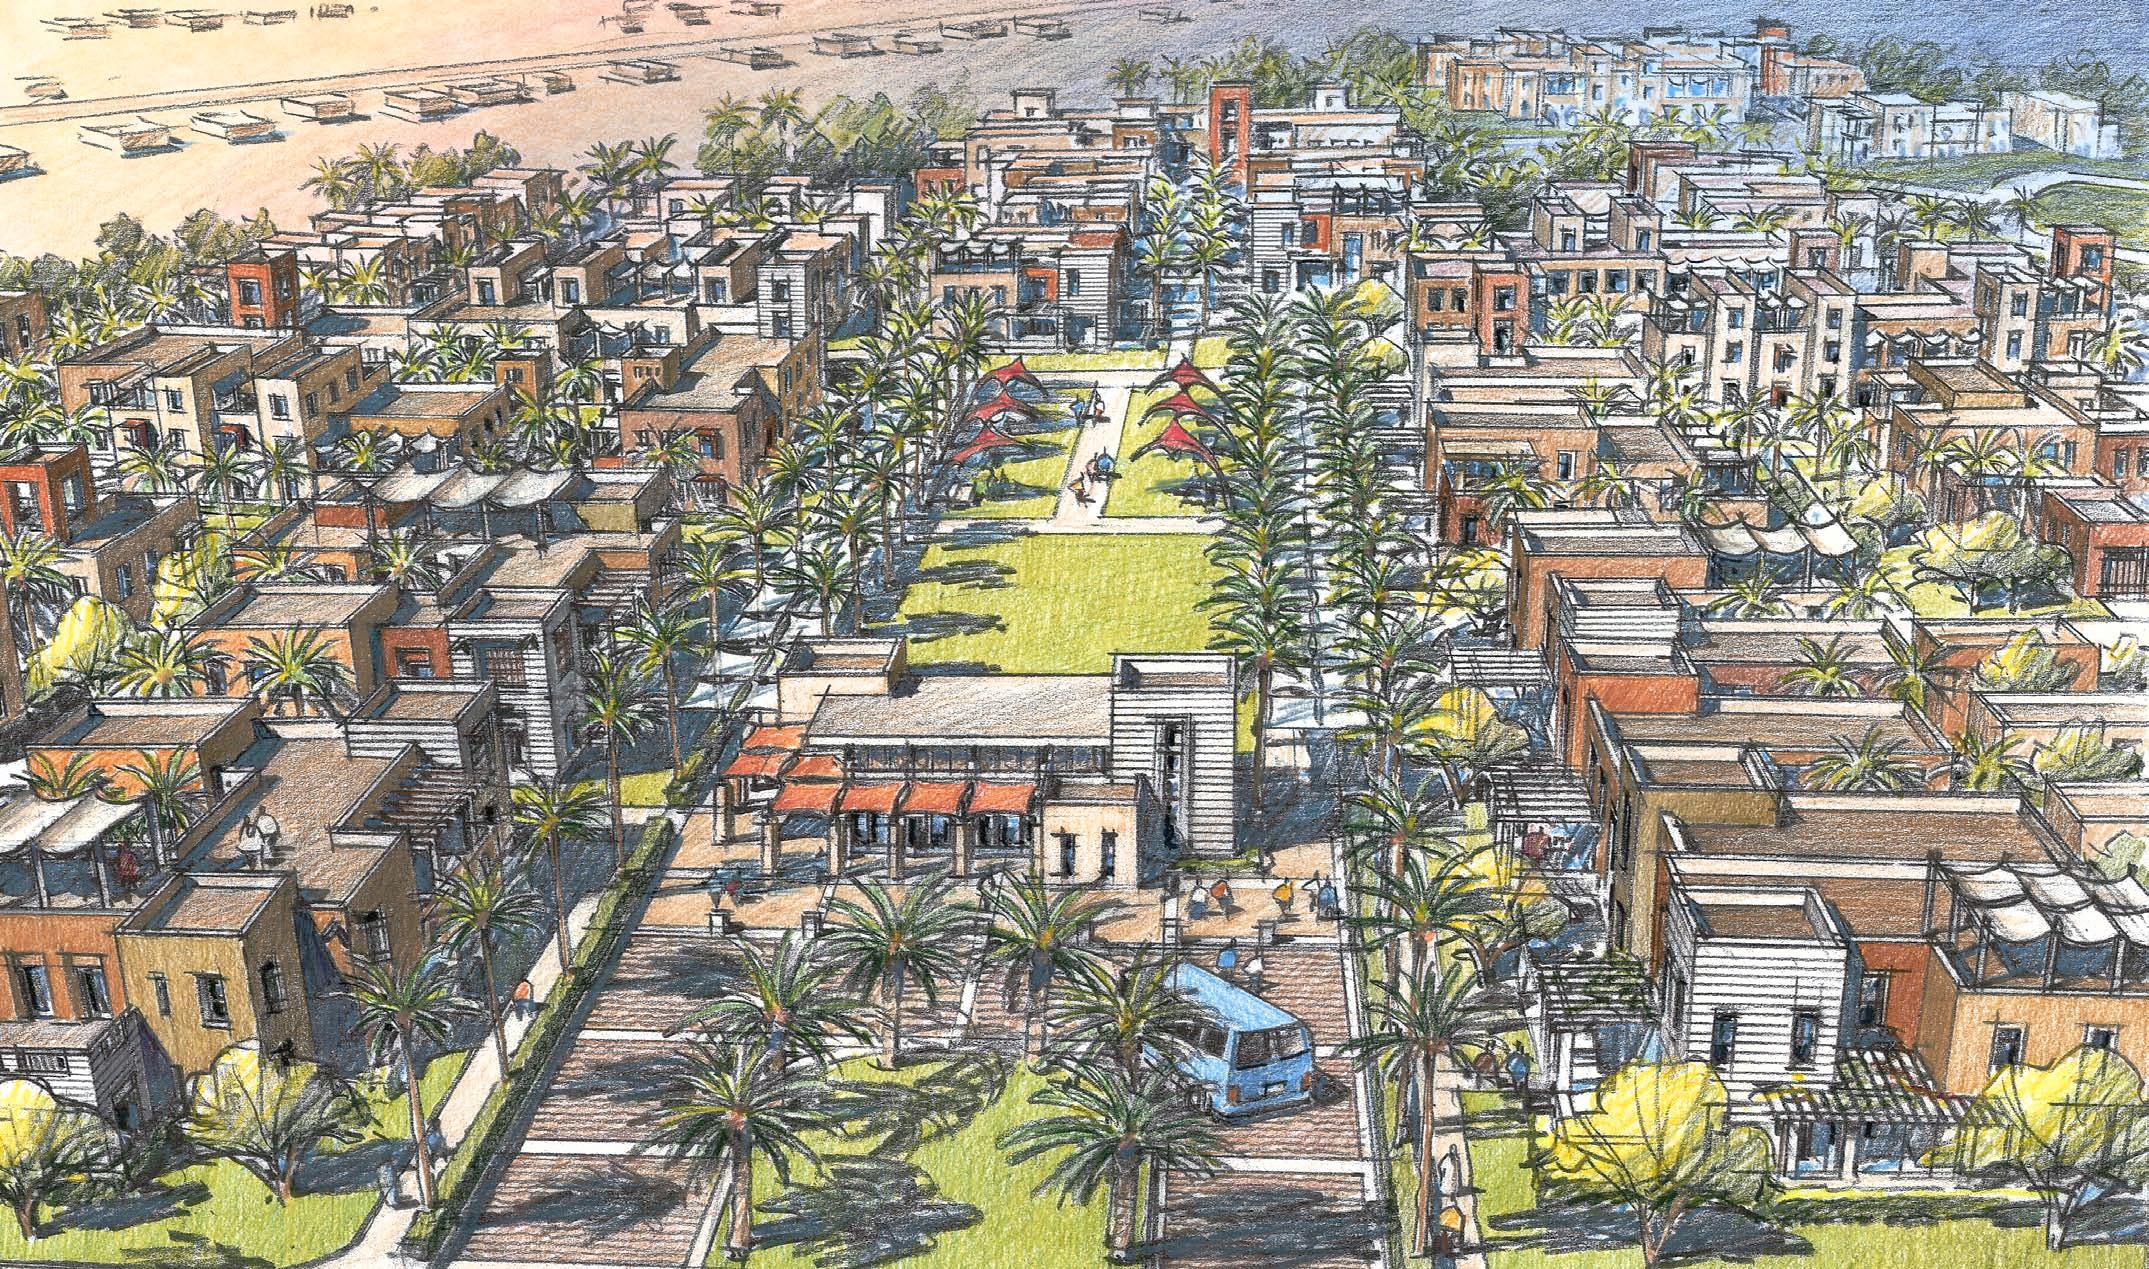 UAE University Academic Living Community,Al Ain, Abu Dhabi